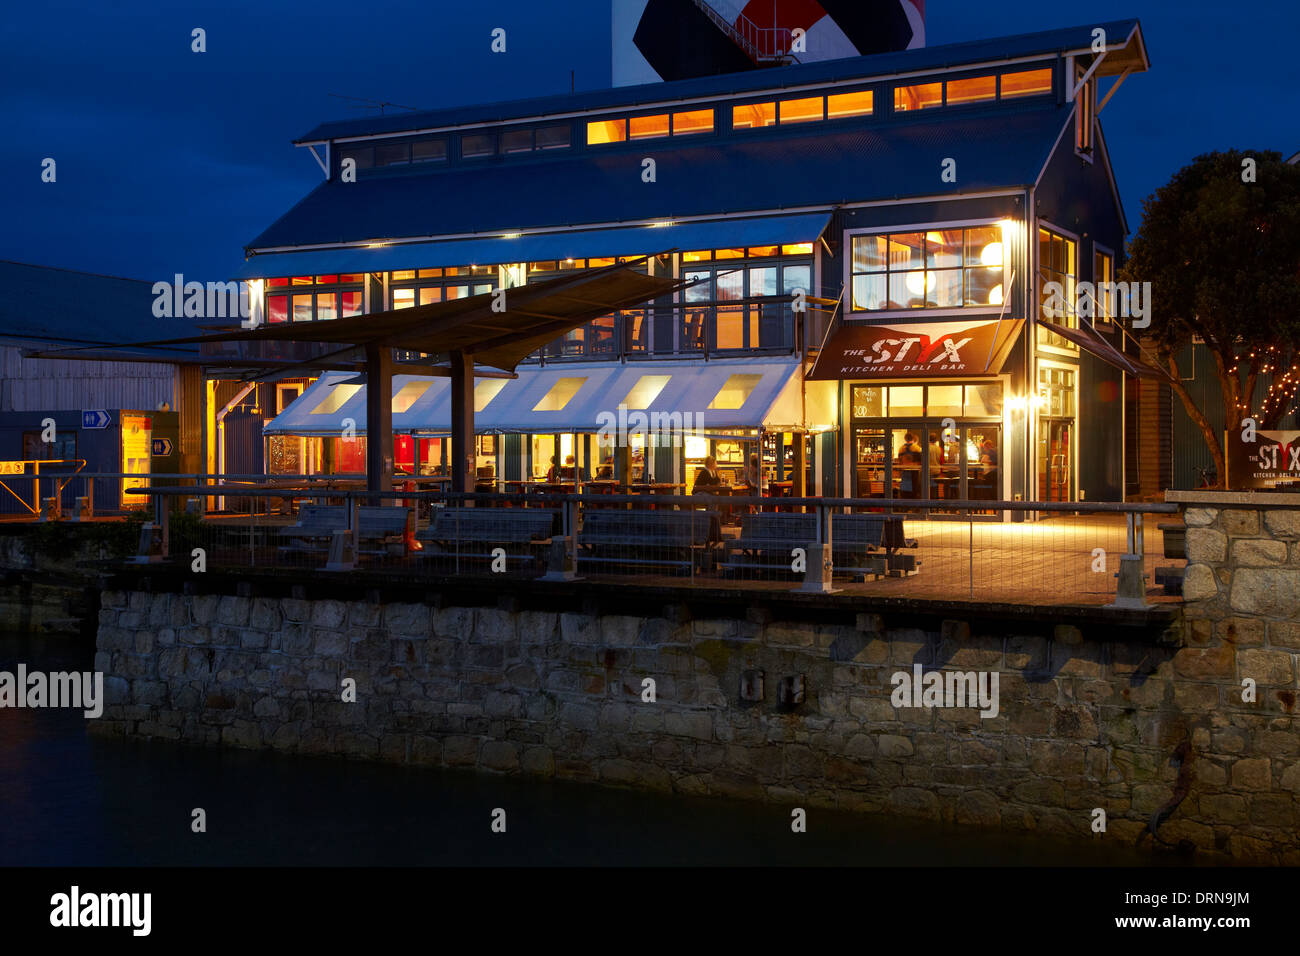 The Styx Kitchen Deli Bar Wakefield Quay Nelson South